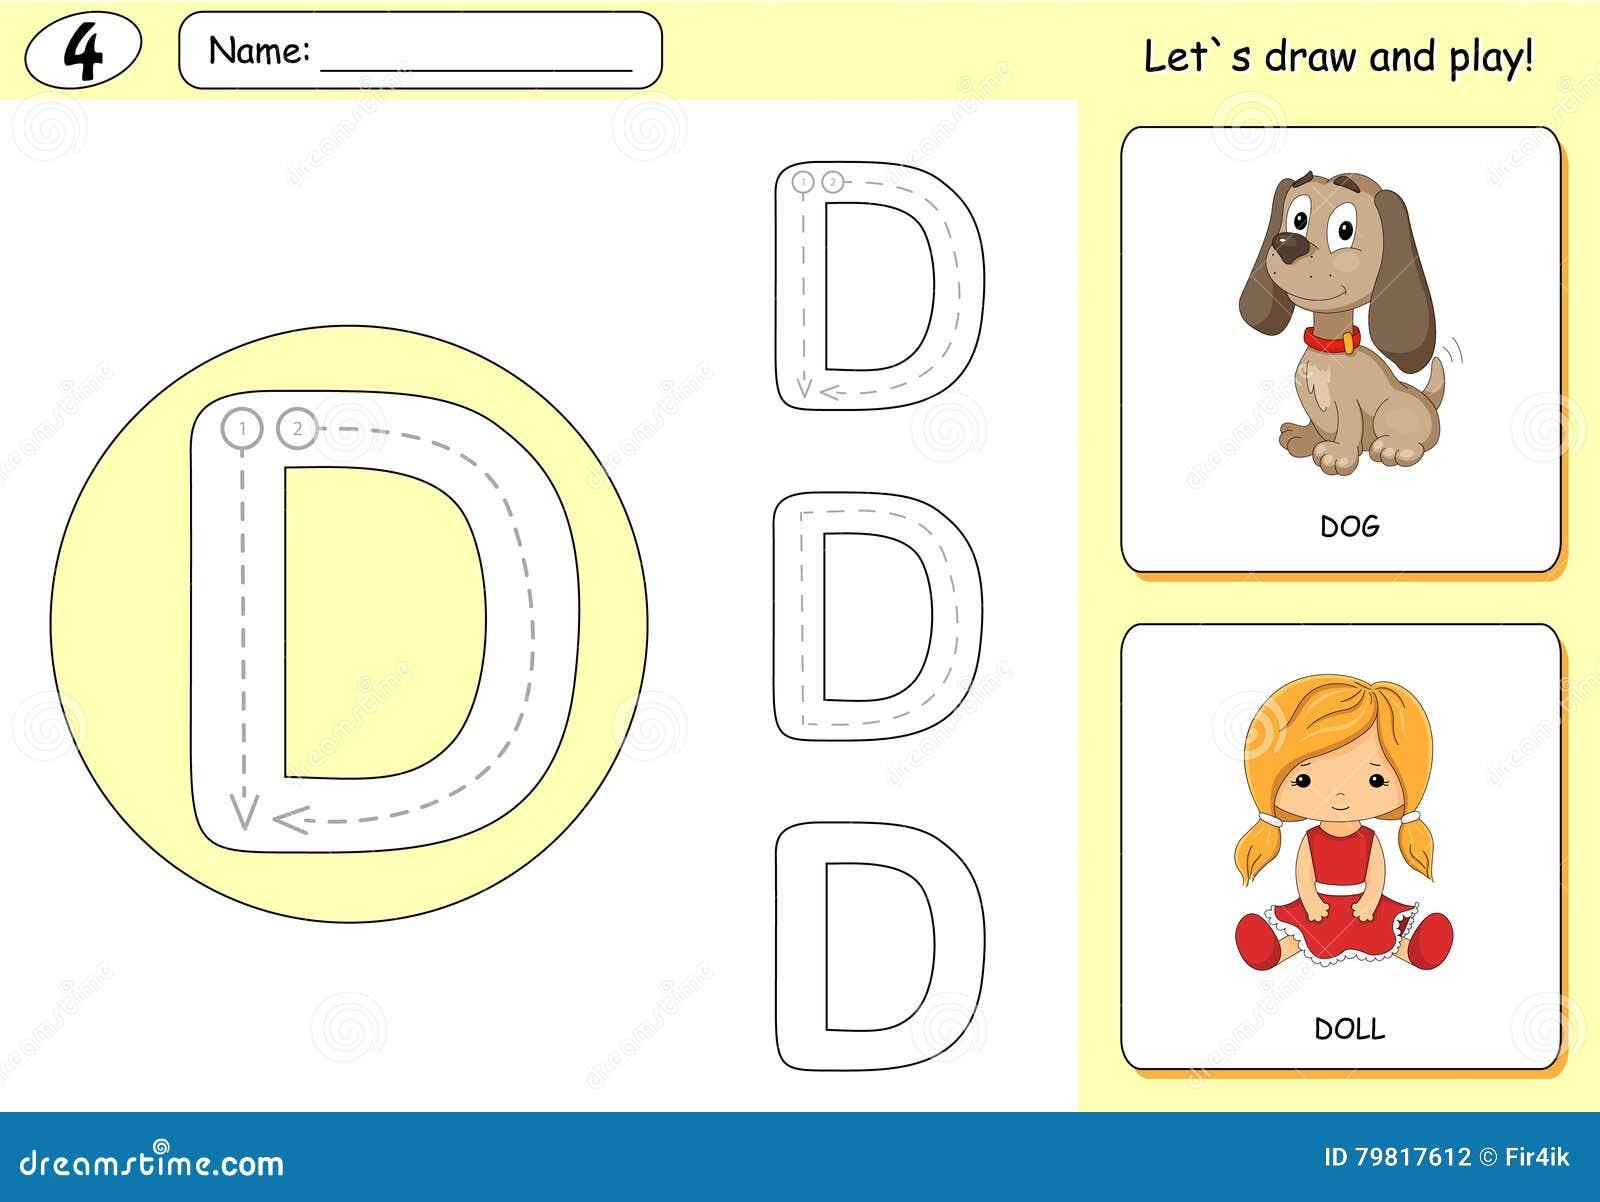 Cartoon Dog And Doll. Alphabet Tracing Worksheet: Writing